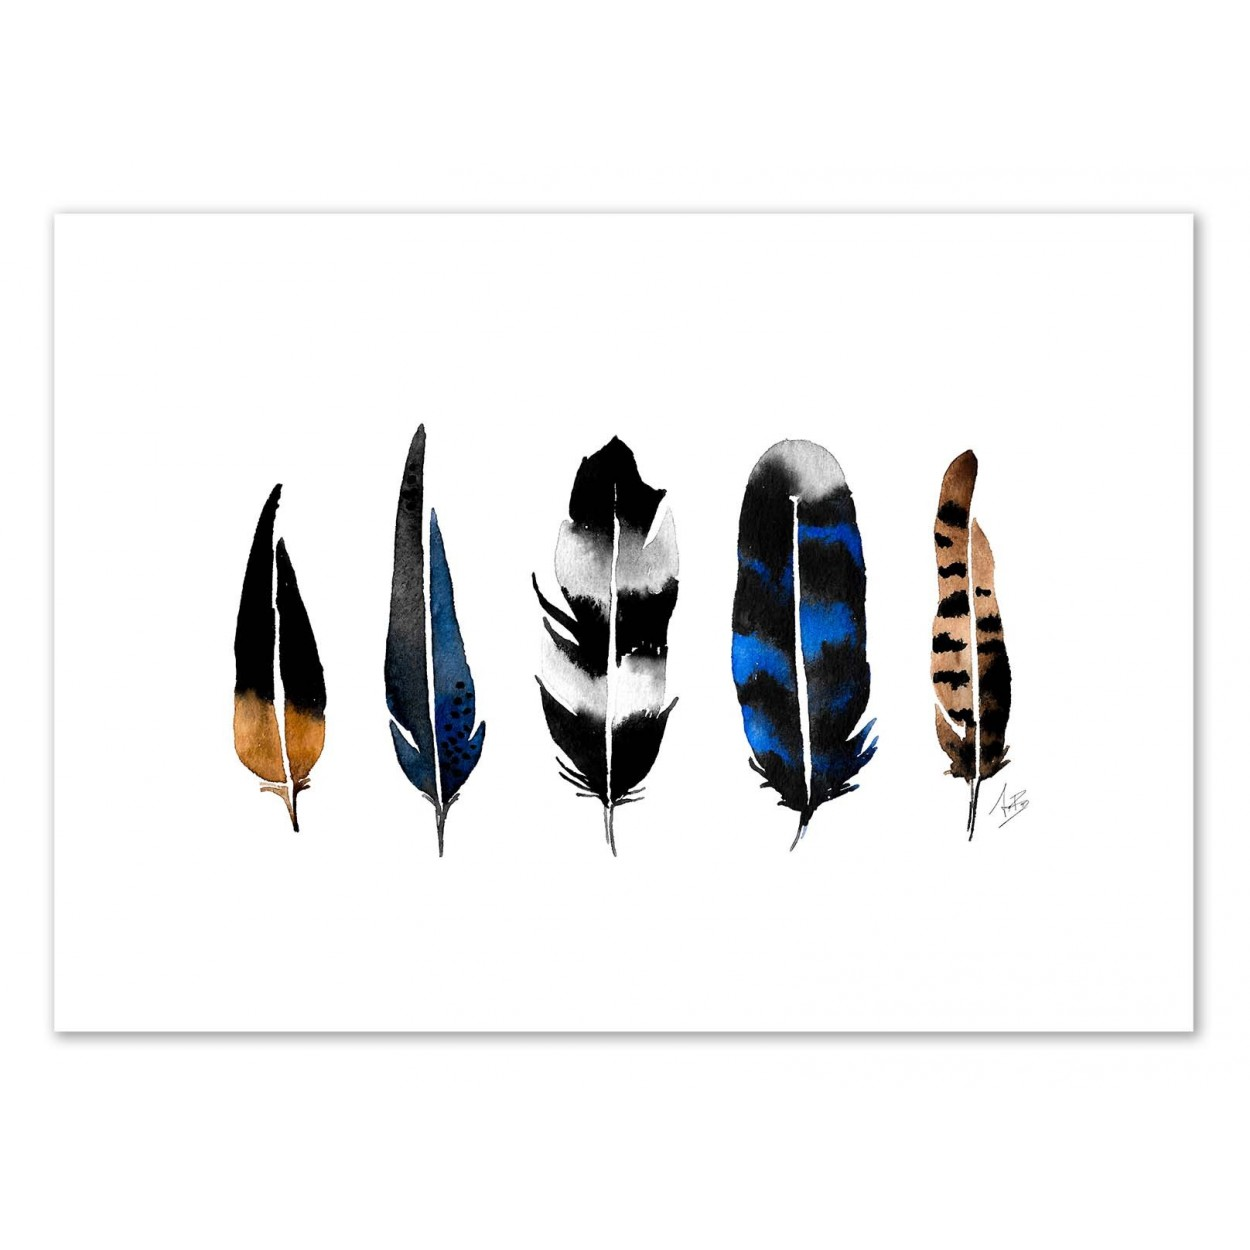 NORTHERN FEATHERS -   Affiche d'art 50 x 70 cm